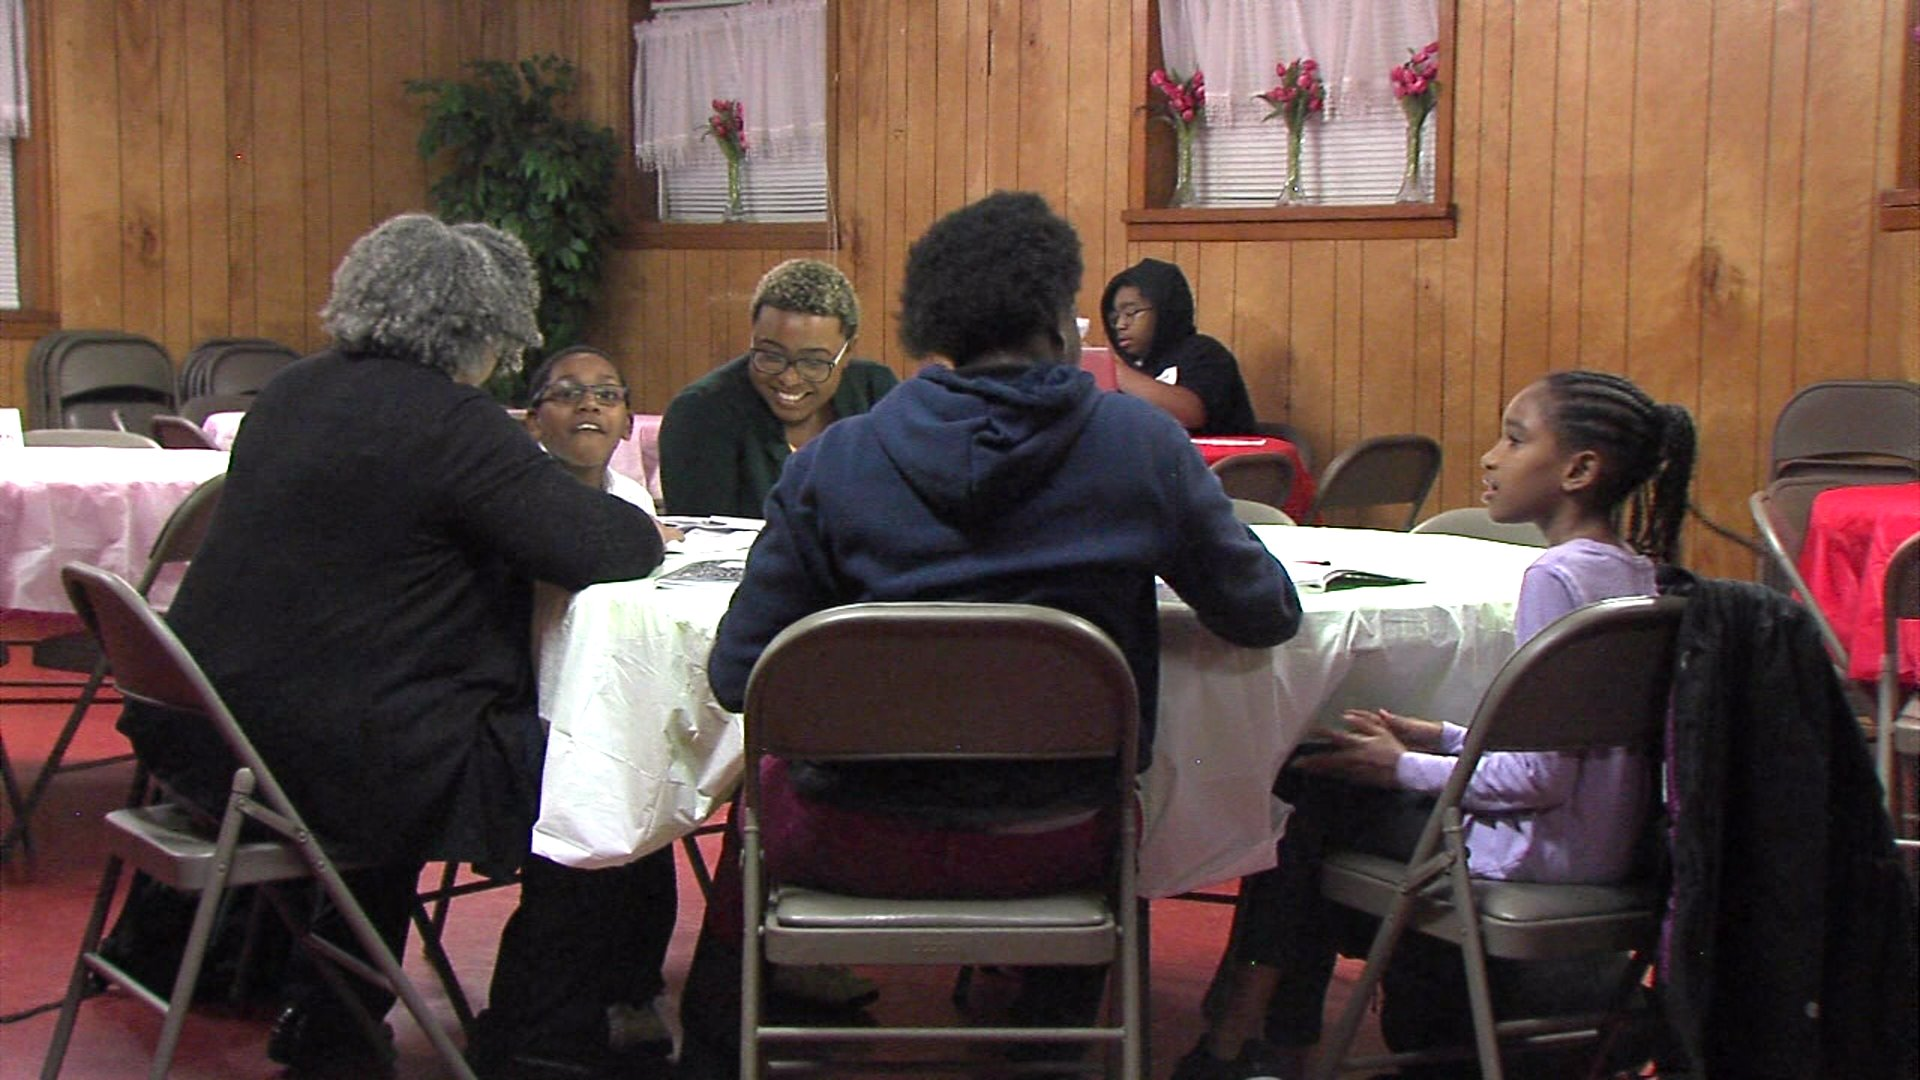 High Point church provides study hall program for kids